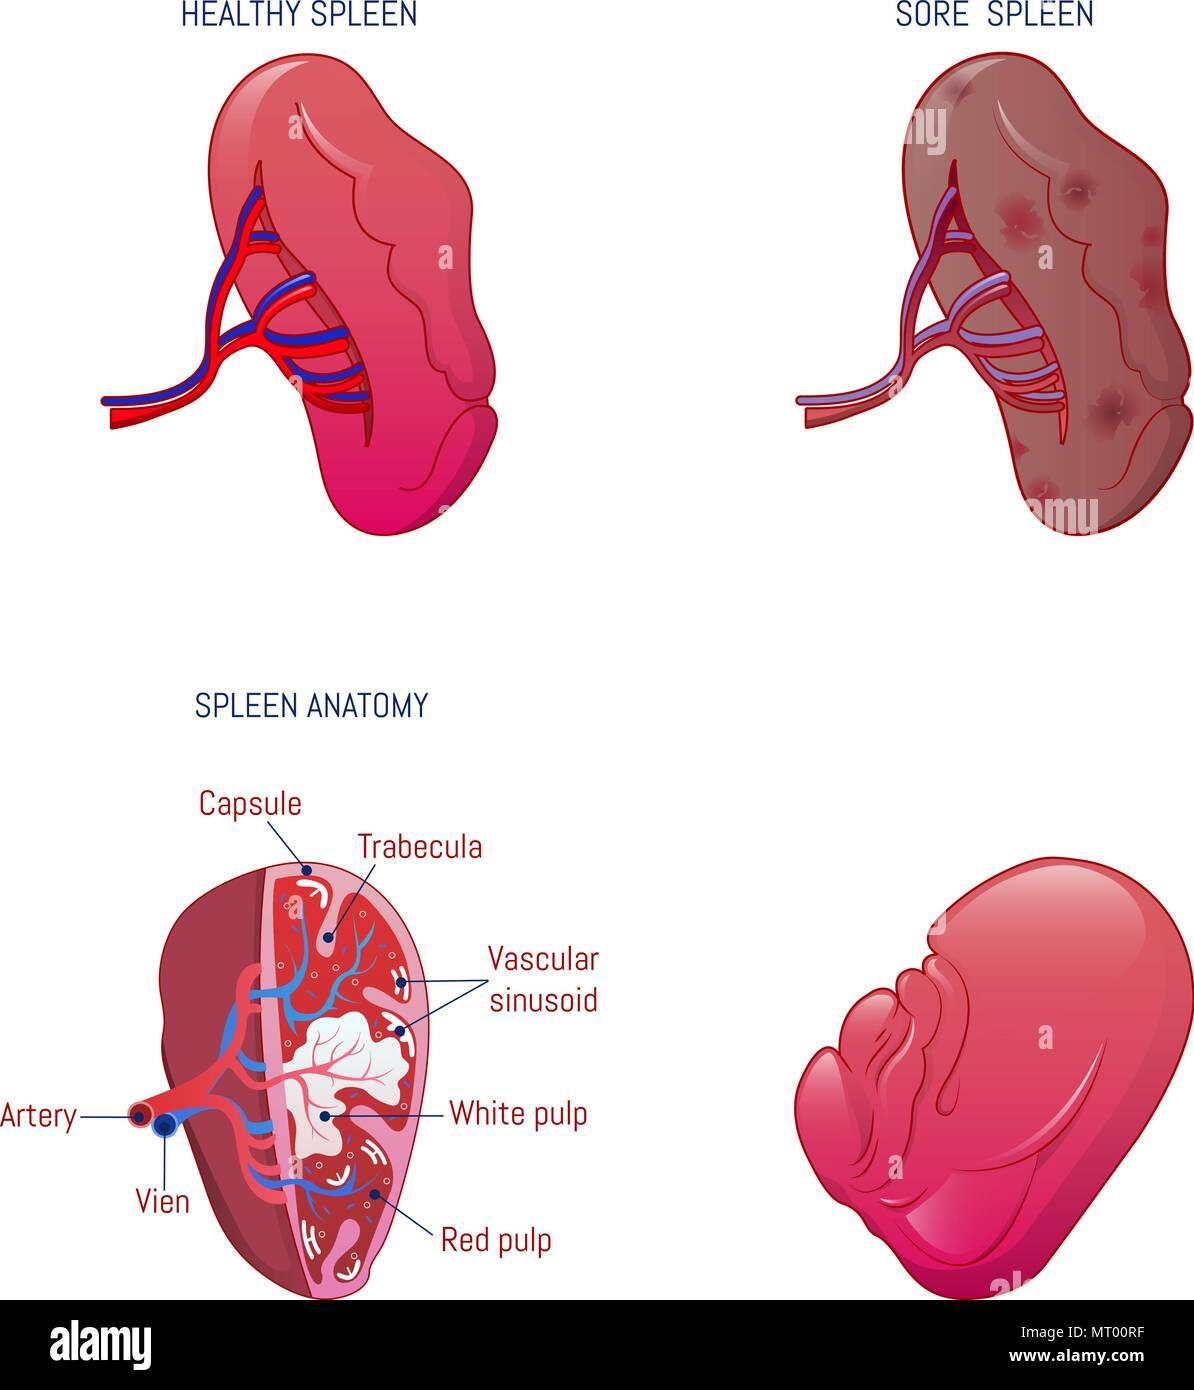 Spleen Anatomy Stock Photos Amp Spleen Anatomy Stock Images